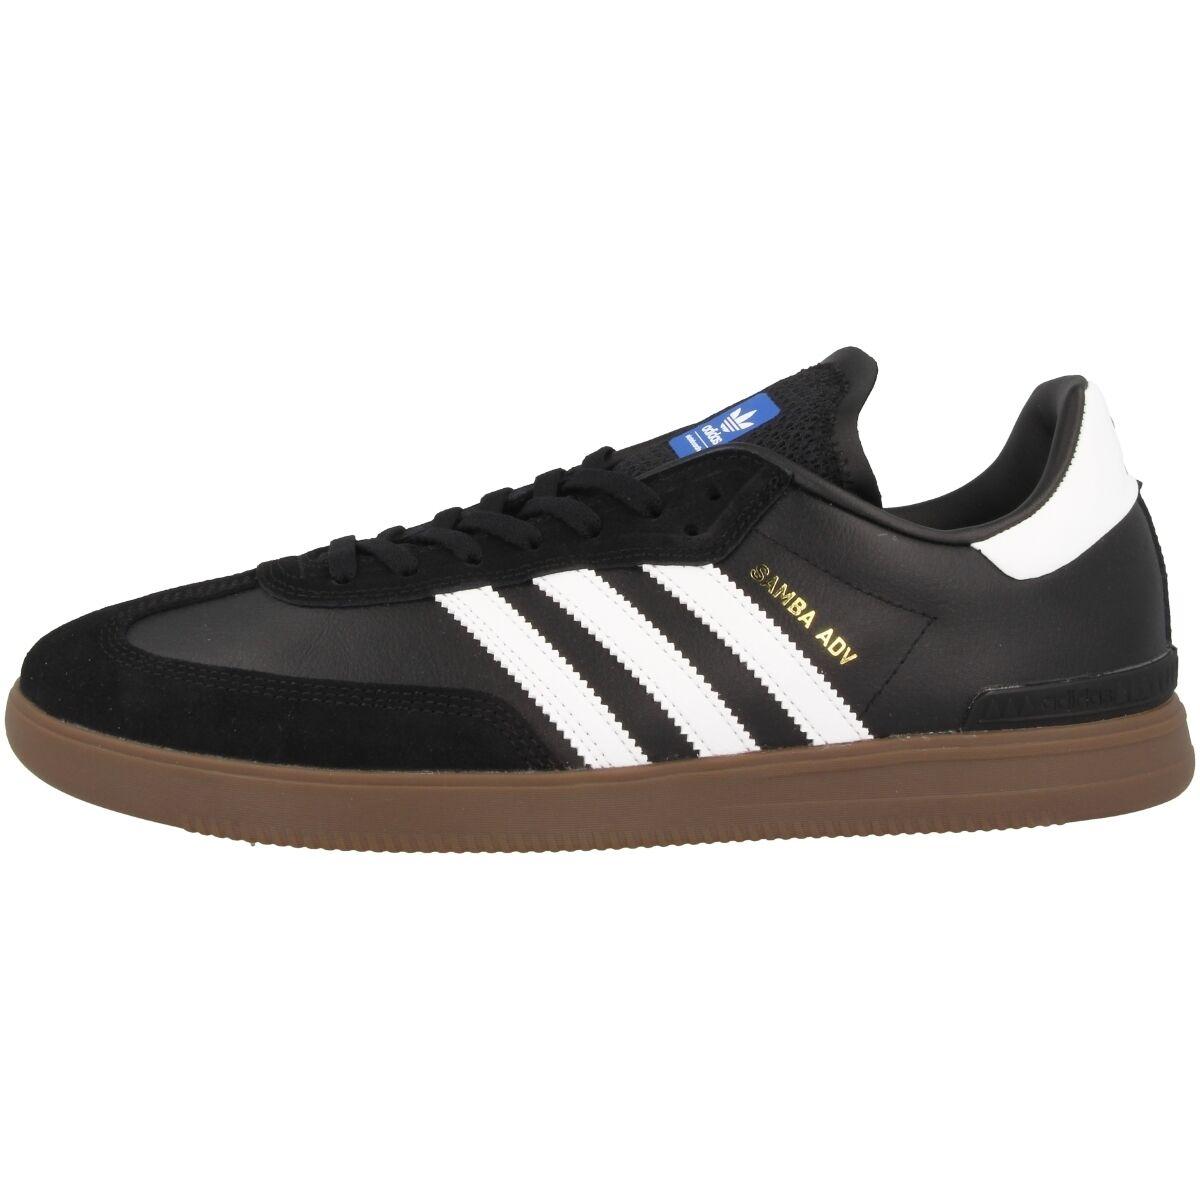 adidas samba top adv chaussures originales niedrigen top samba - skate - korb noir bb8685 07349f